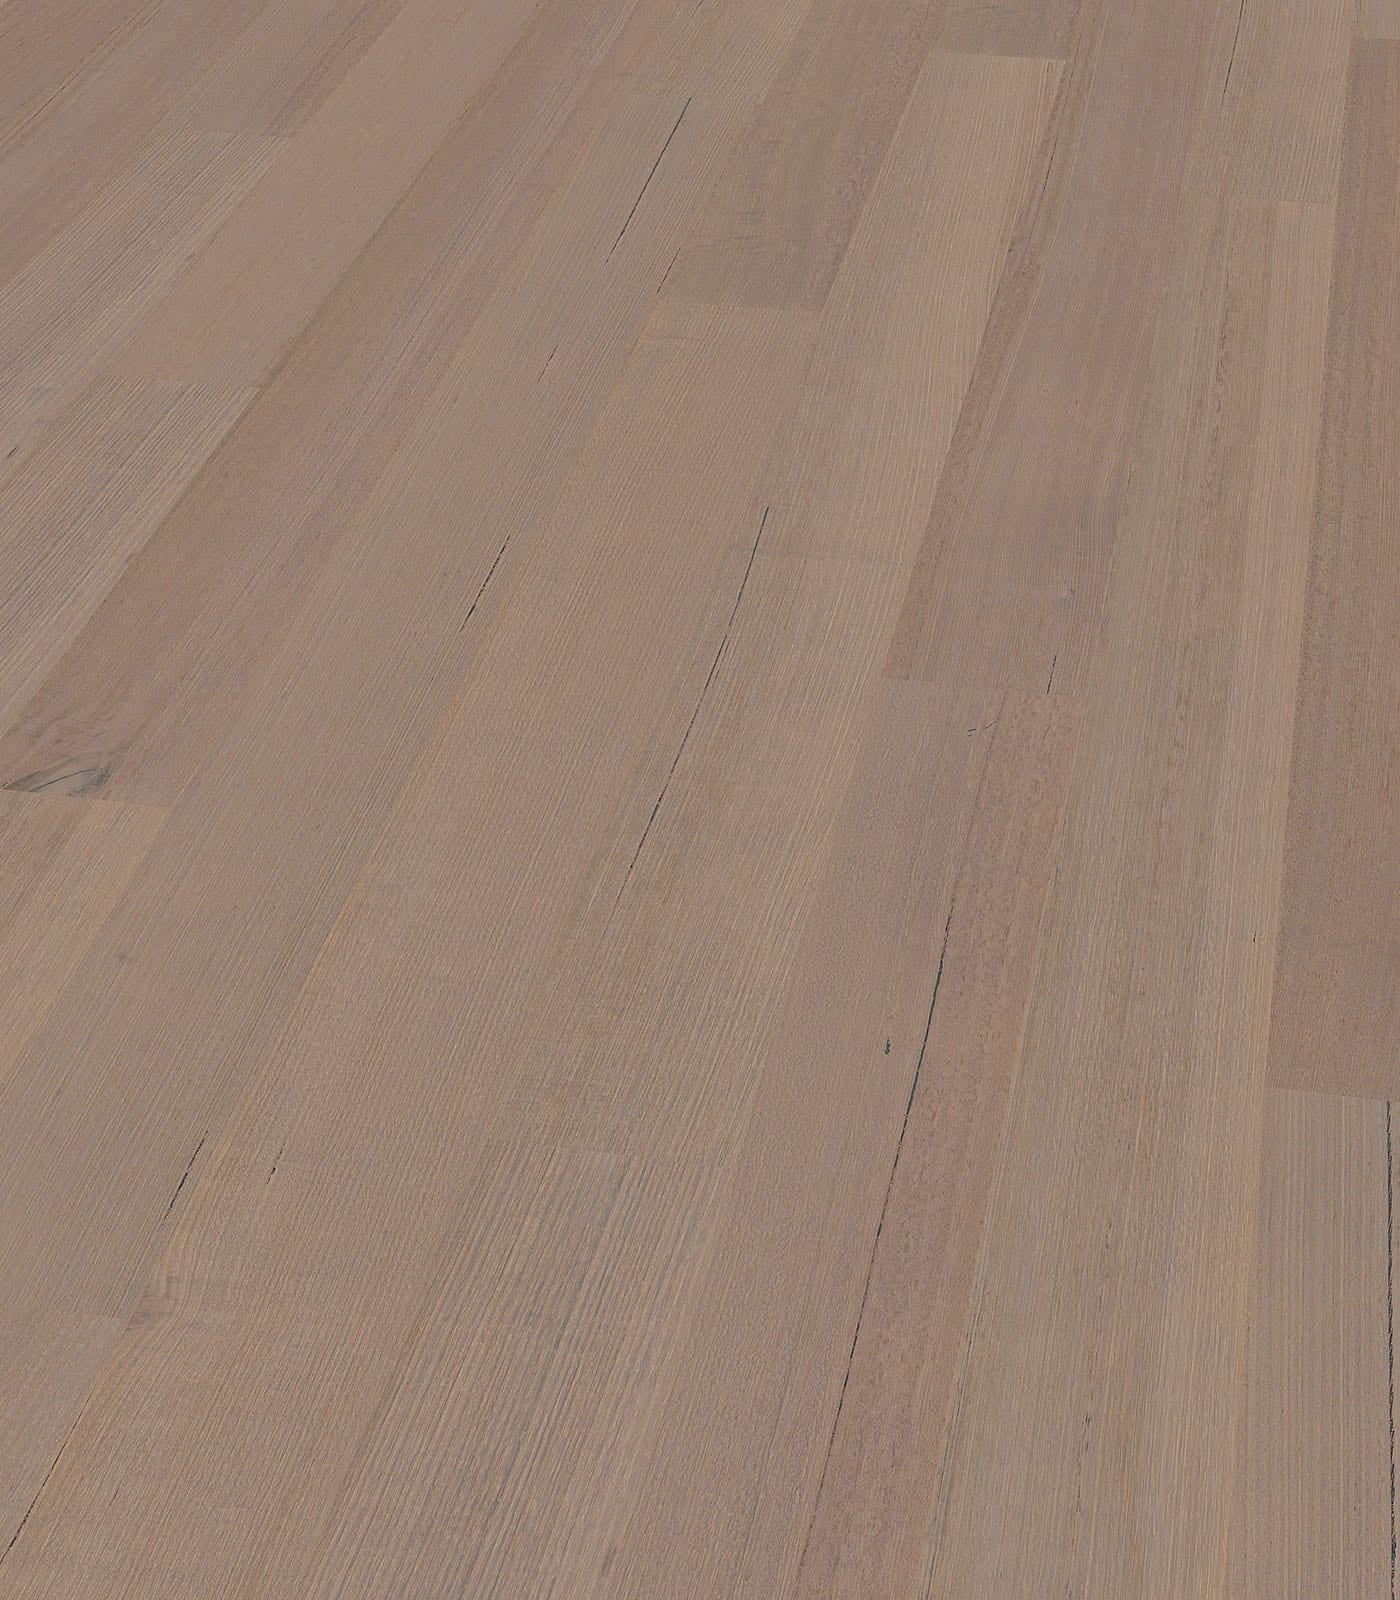 Esperance-Tasmanian Oak floors-After Oak collection-angle